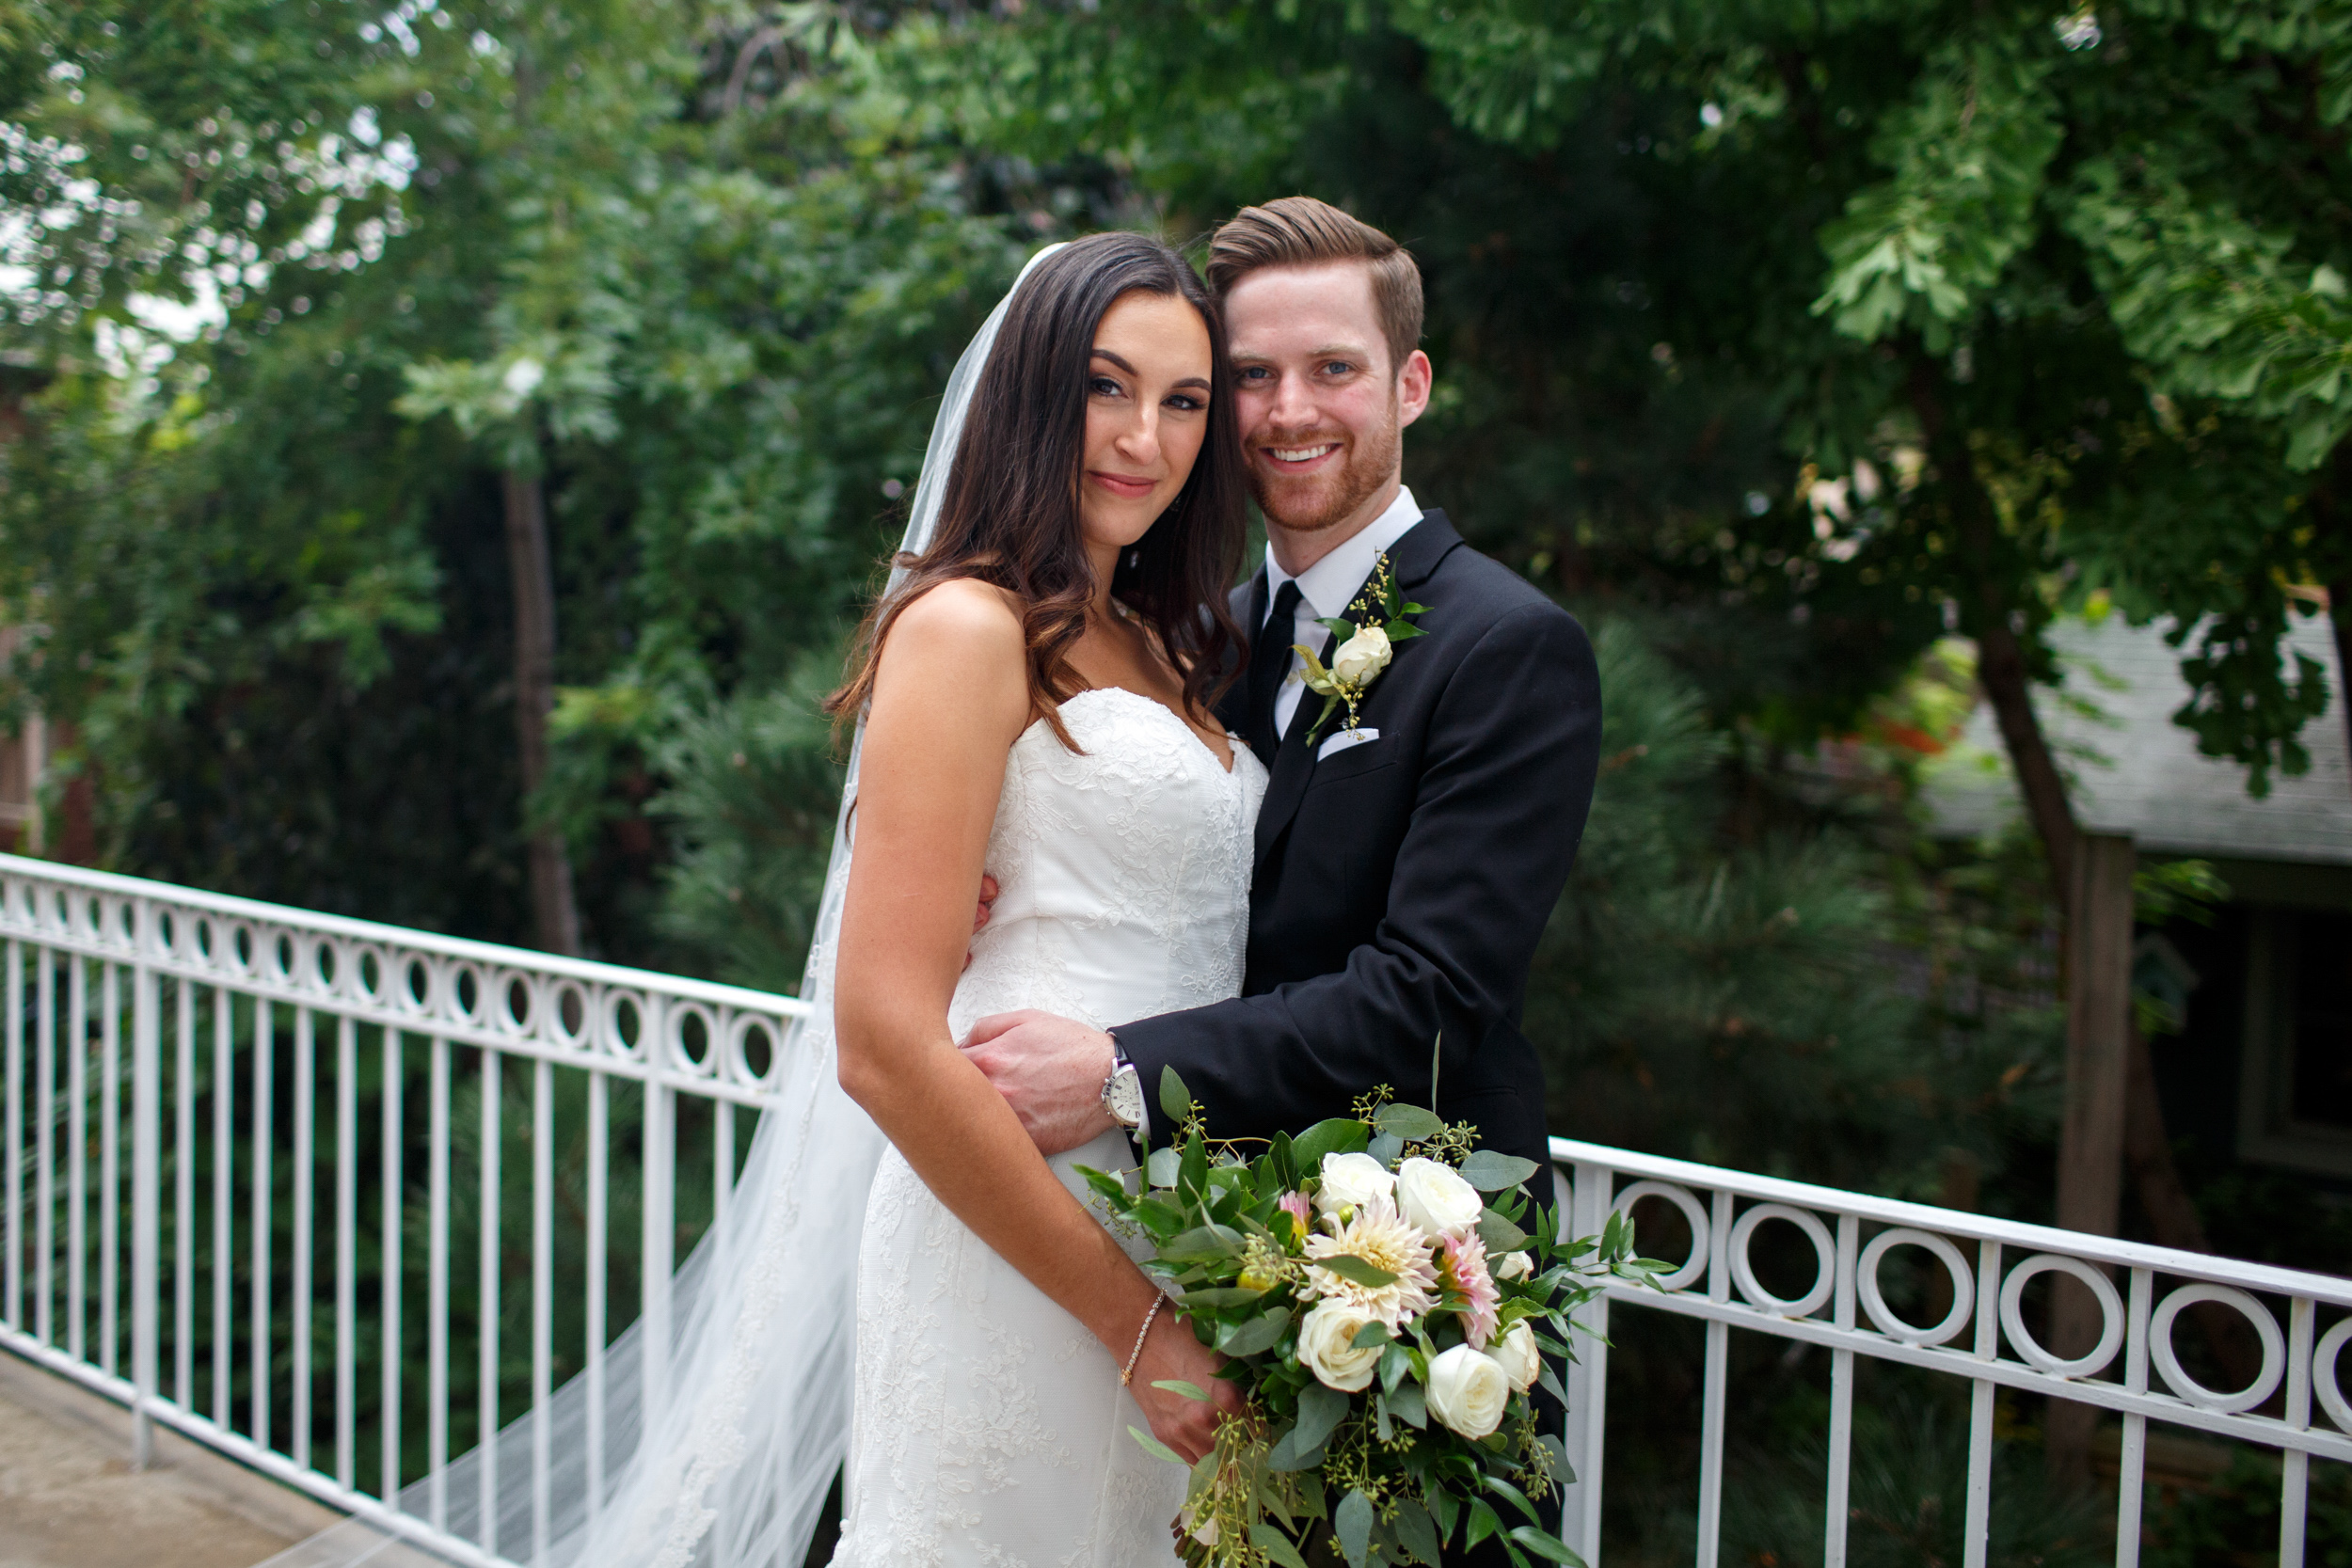 9-09-2016 Flora & Colin wedding photography by Brian Milo-165.jpg